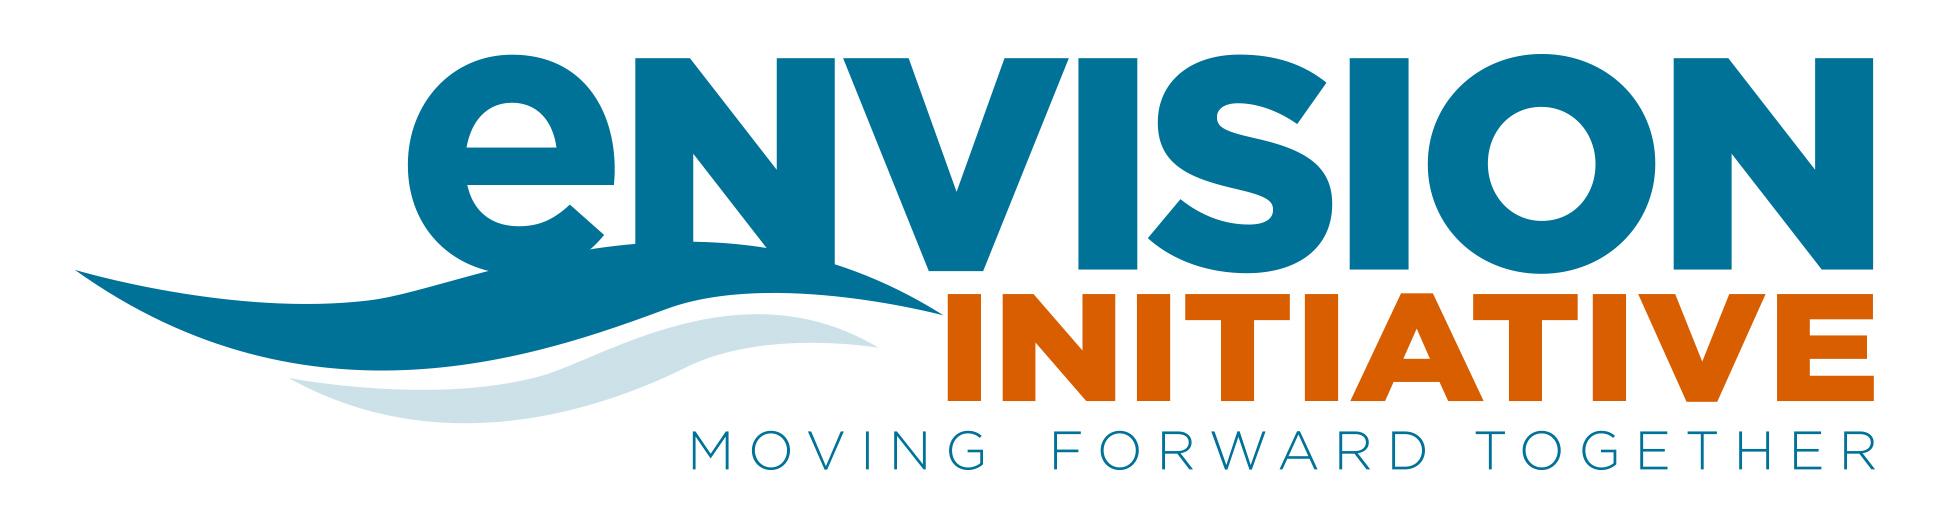 envision initiative logo